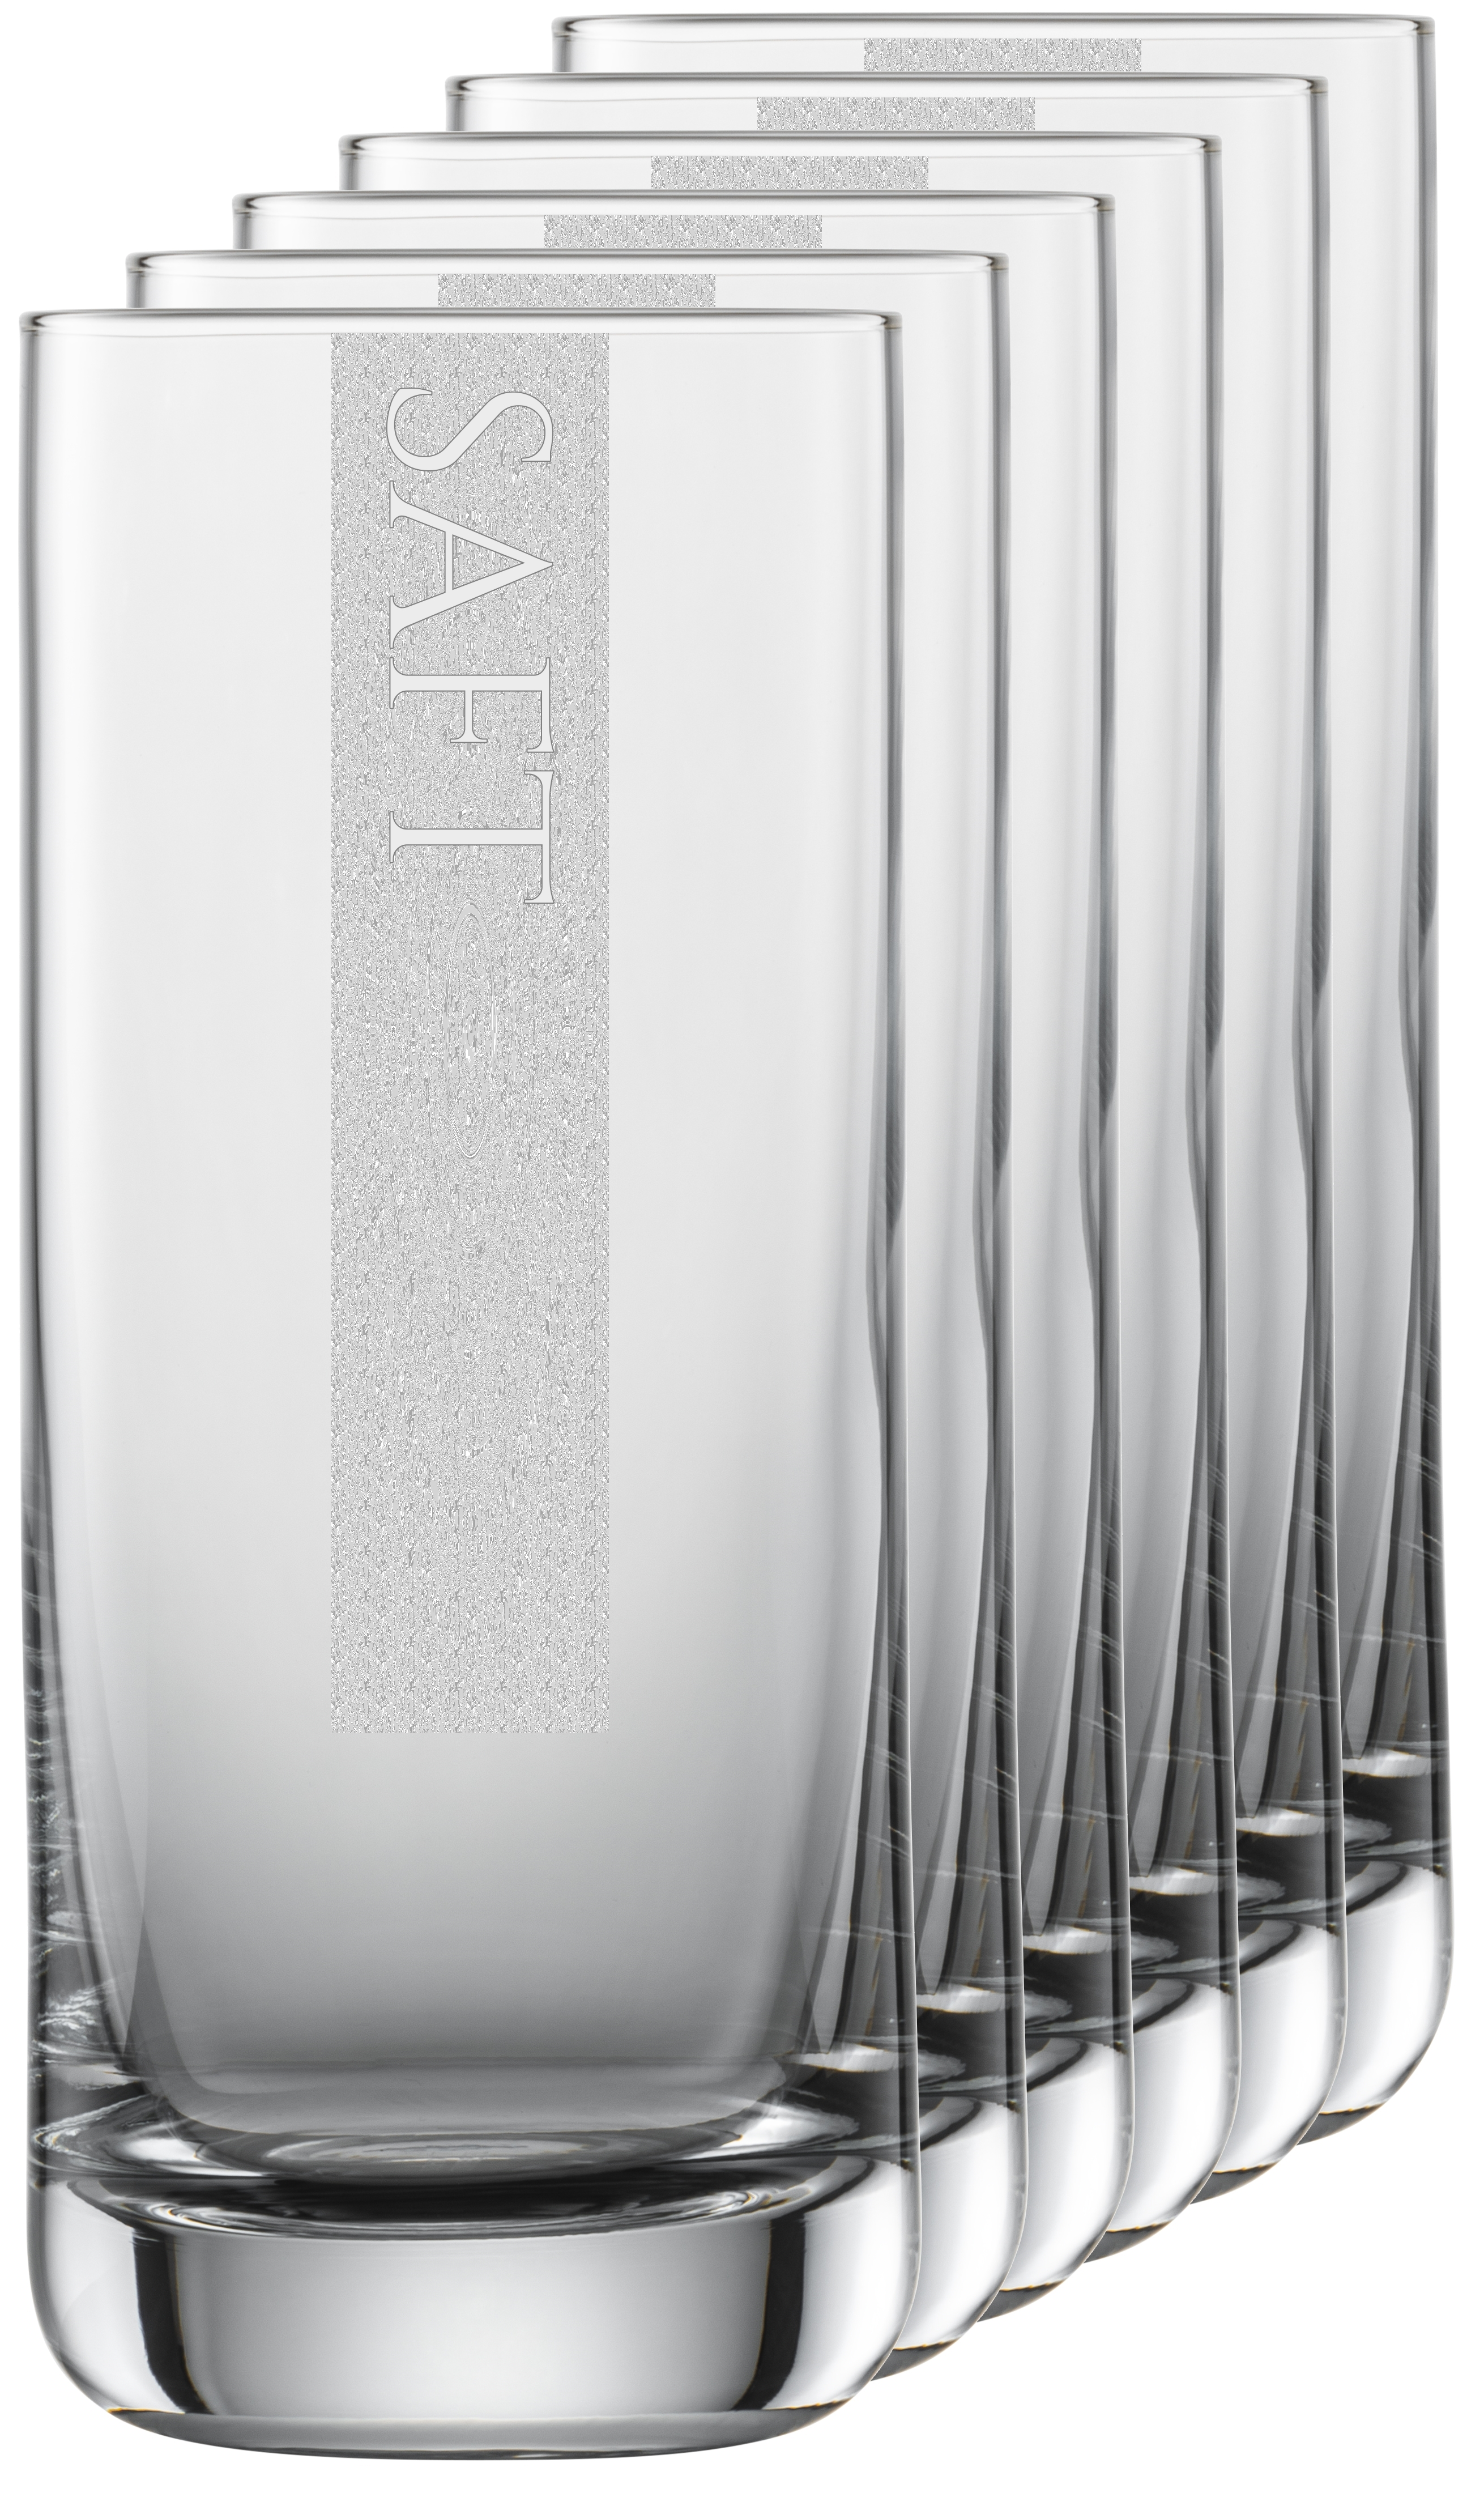 SAFT Gläser | 6 Stück 390ml Schott Longdrinkglas | CoolGlas